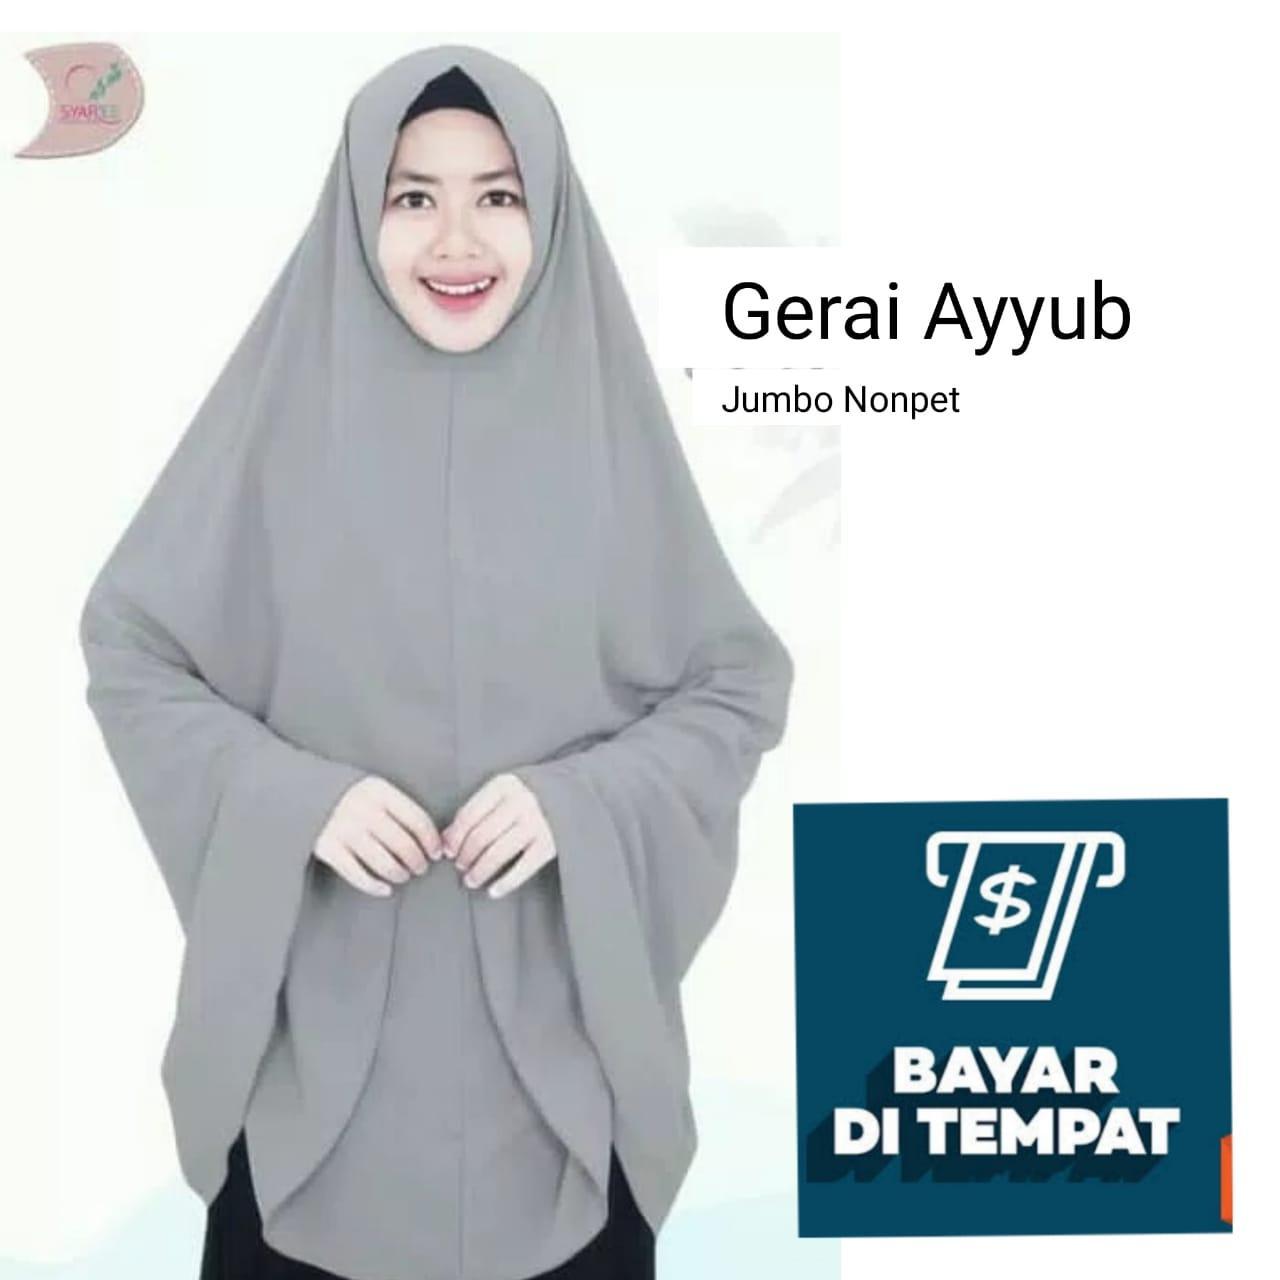 Jilbab / Hijab Instan JUMBO NON PET khimar syari kerudung instan gerai ayyub